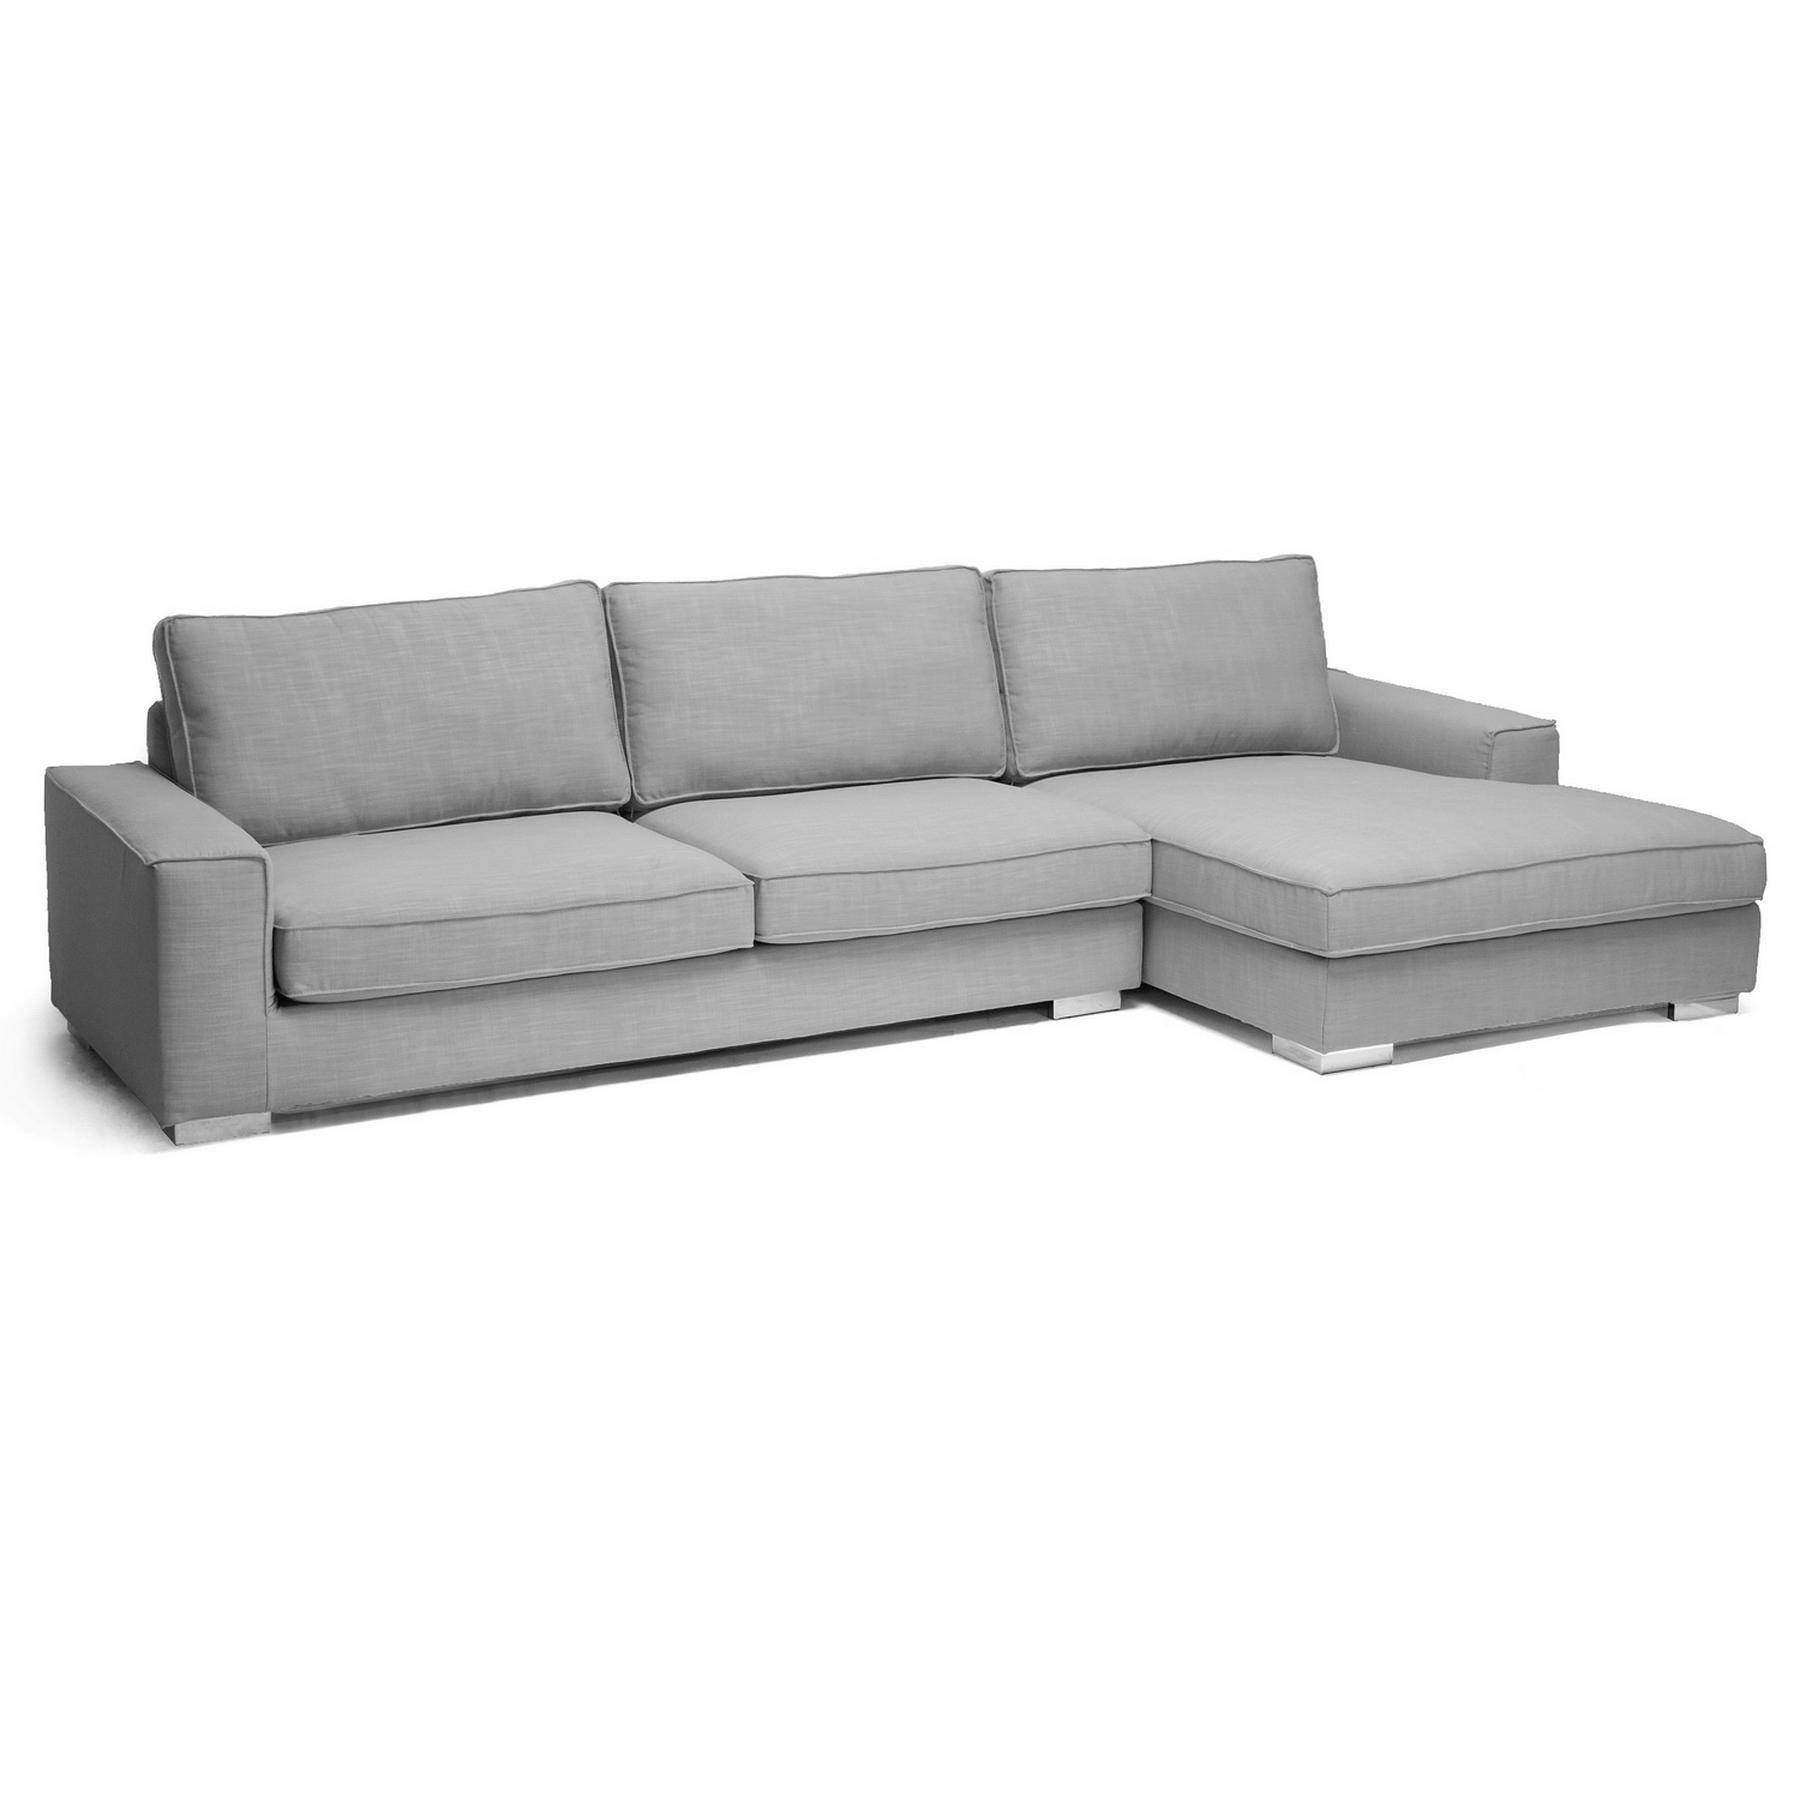 Sectional Sofa Grey Baxton Studio: Baxton Studio Brigitte Gray Modern Sectional Sofa